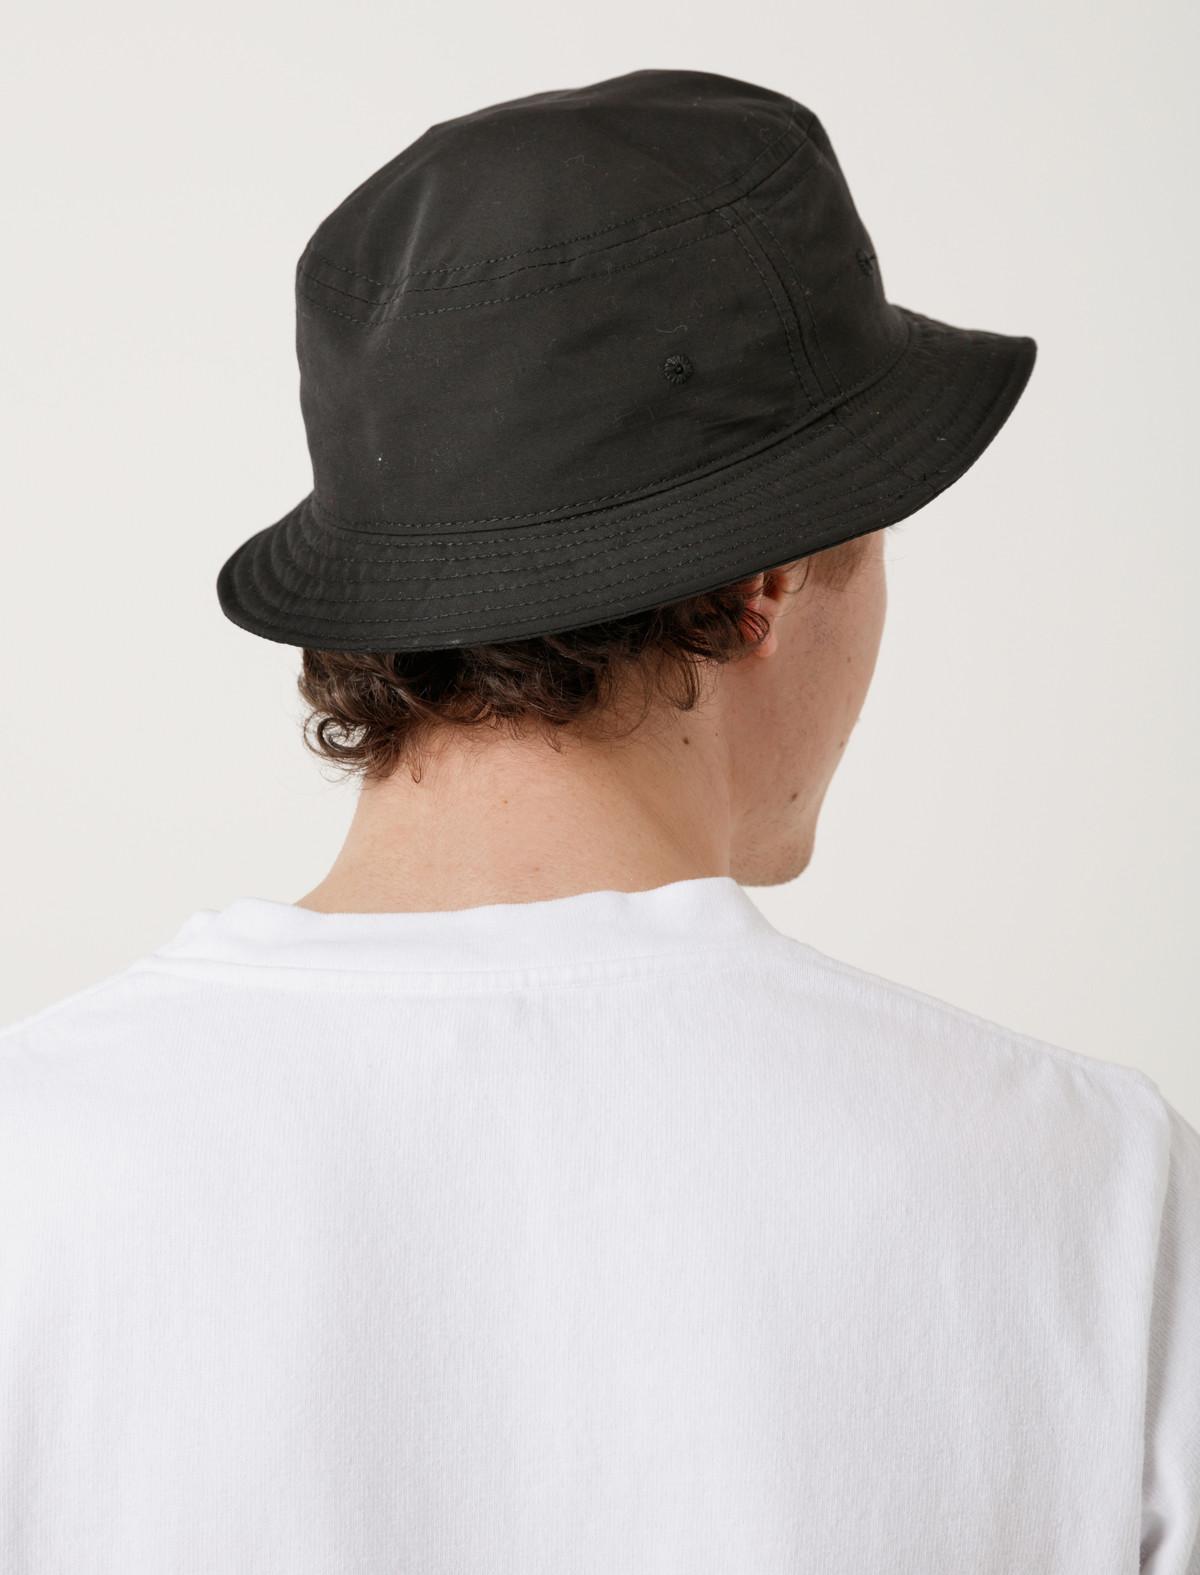 23a640641c7 Paa Bucket Hat Black